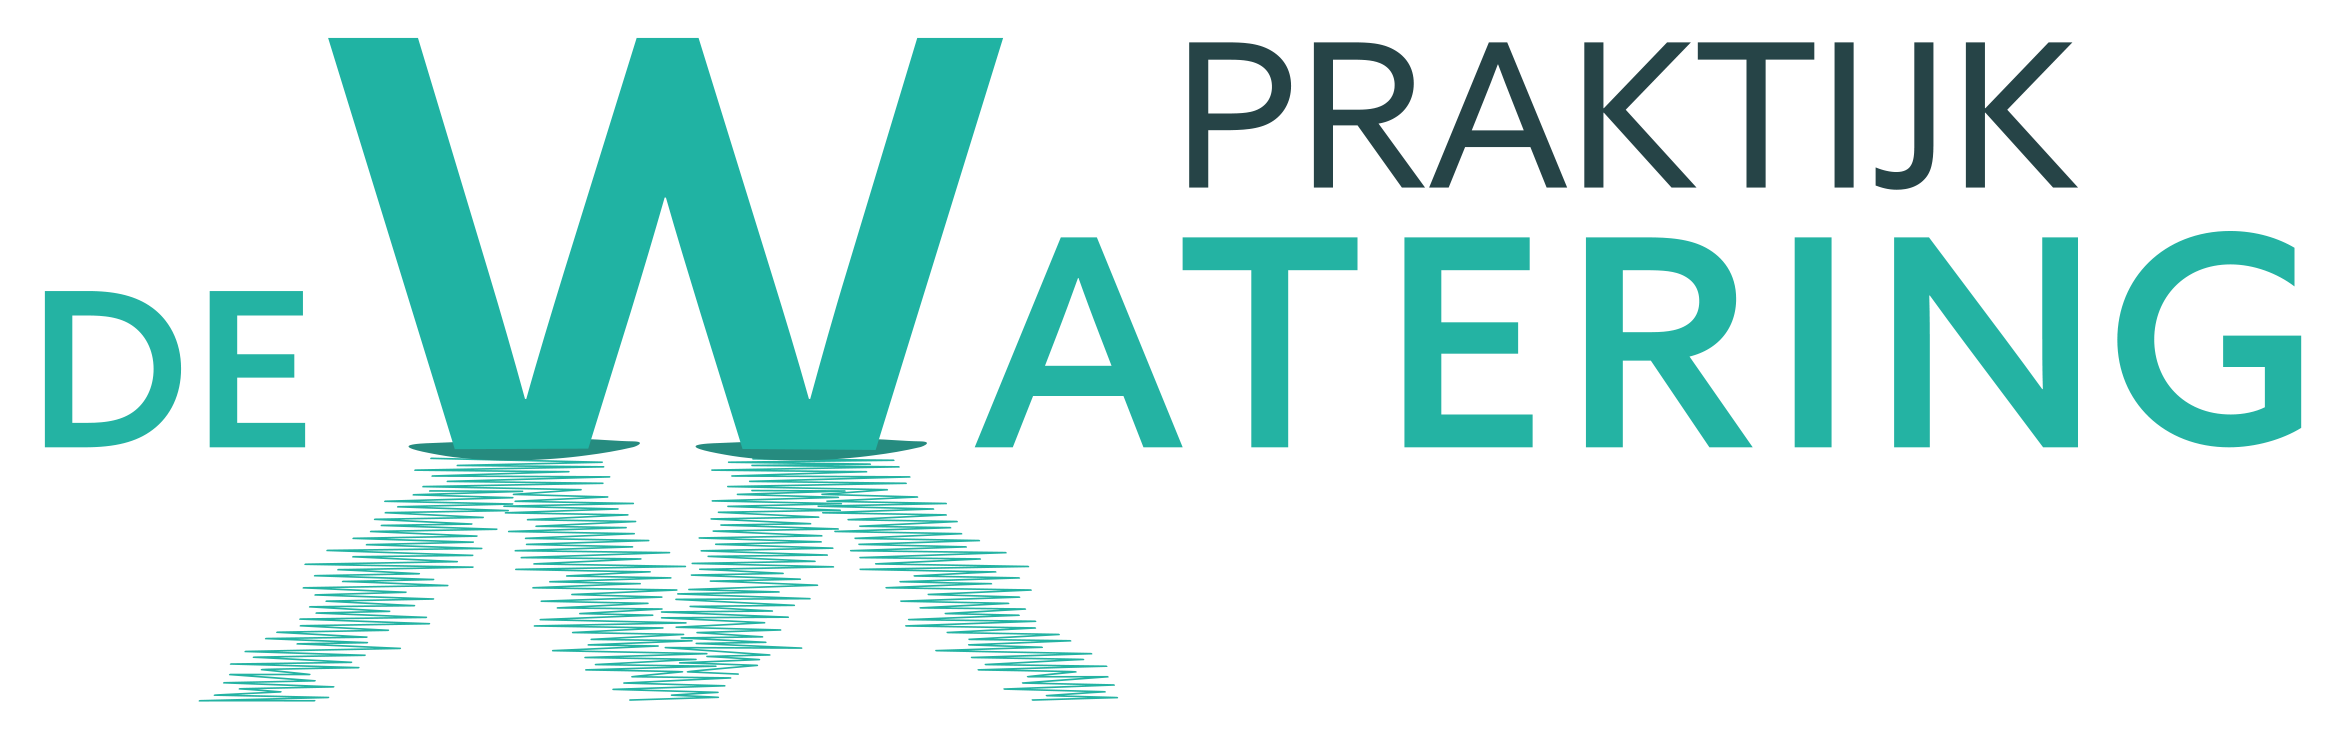 logo praktijk de watering